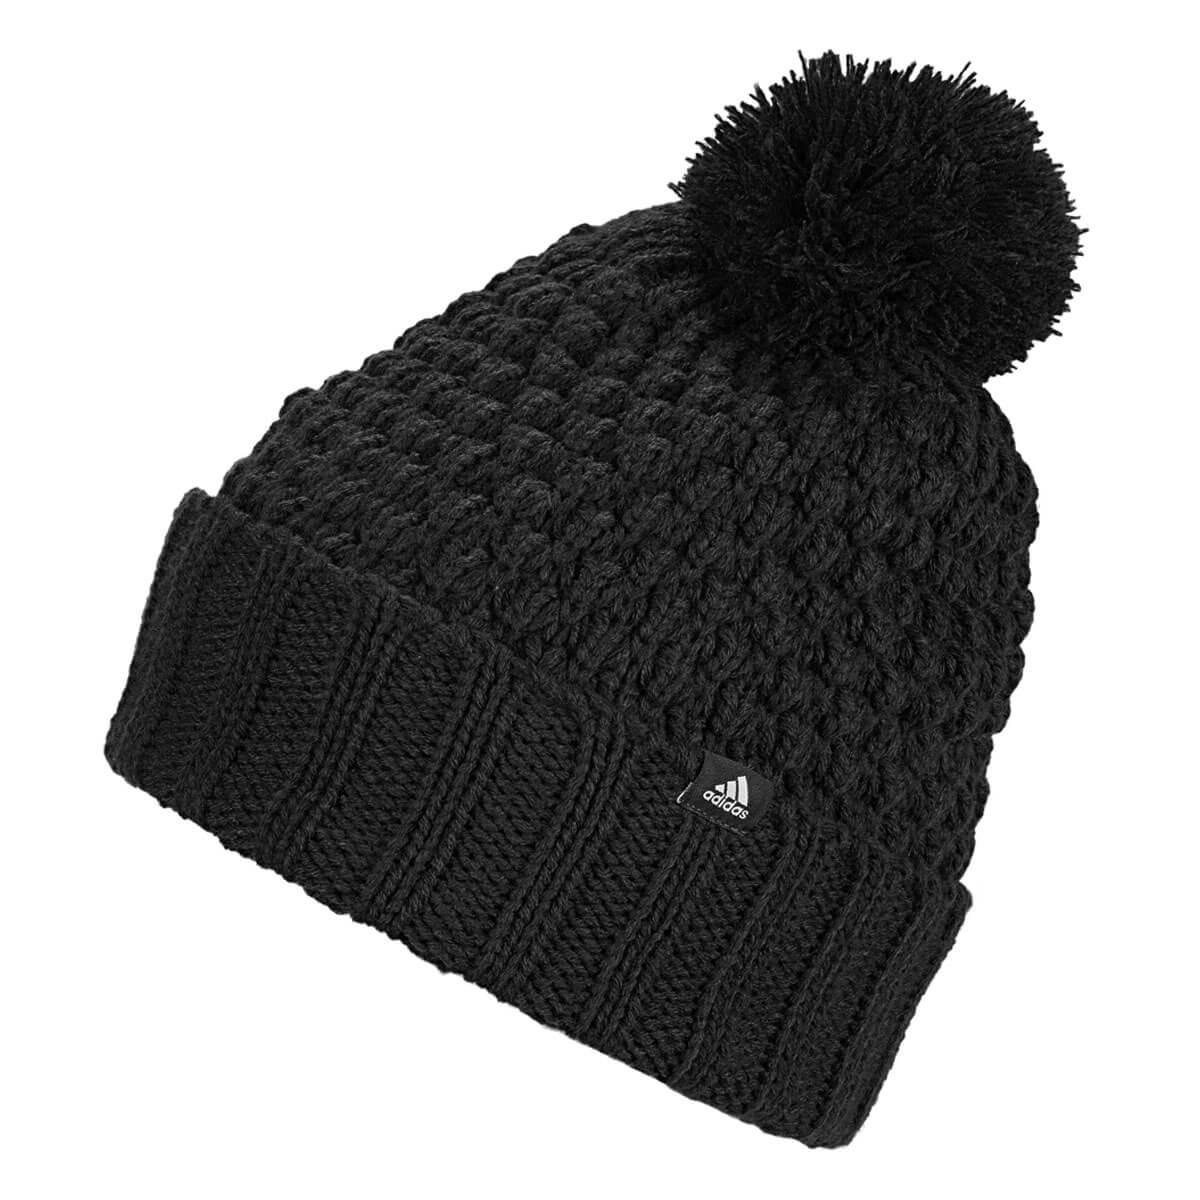 06cb9b46a2c1fc adidas Womens 2019 Climawarm Lined Beanie Hat